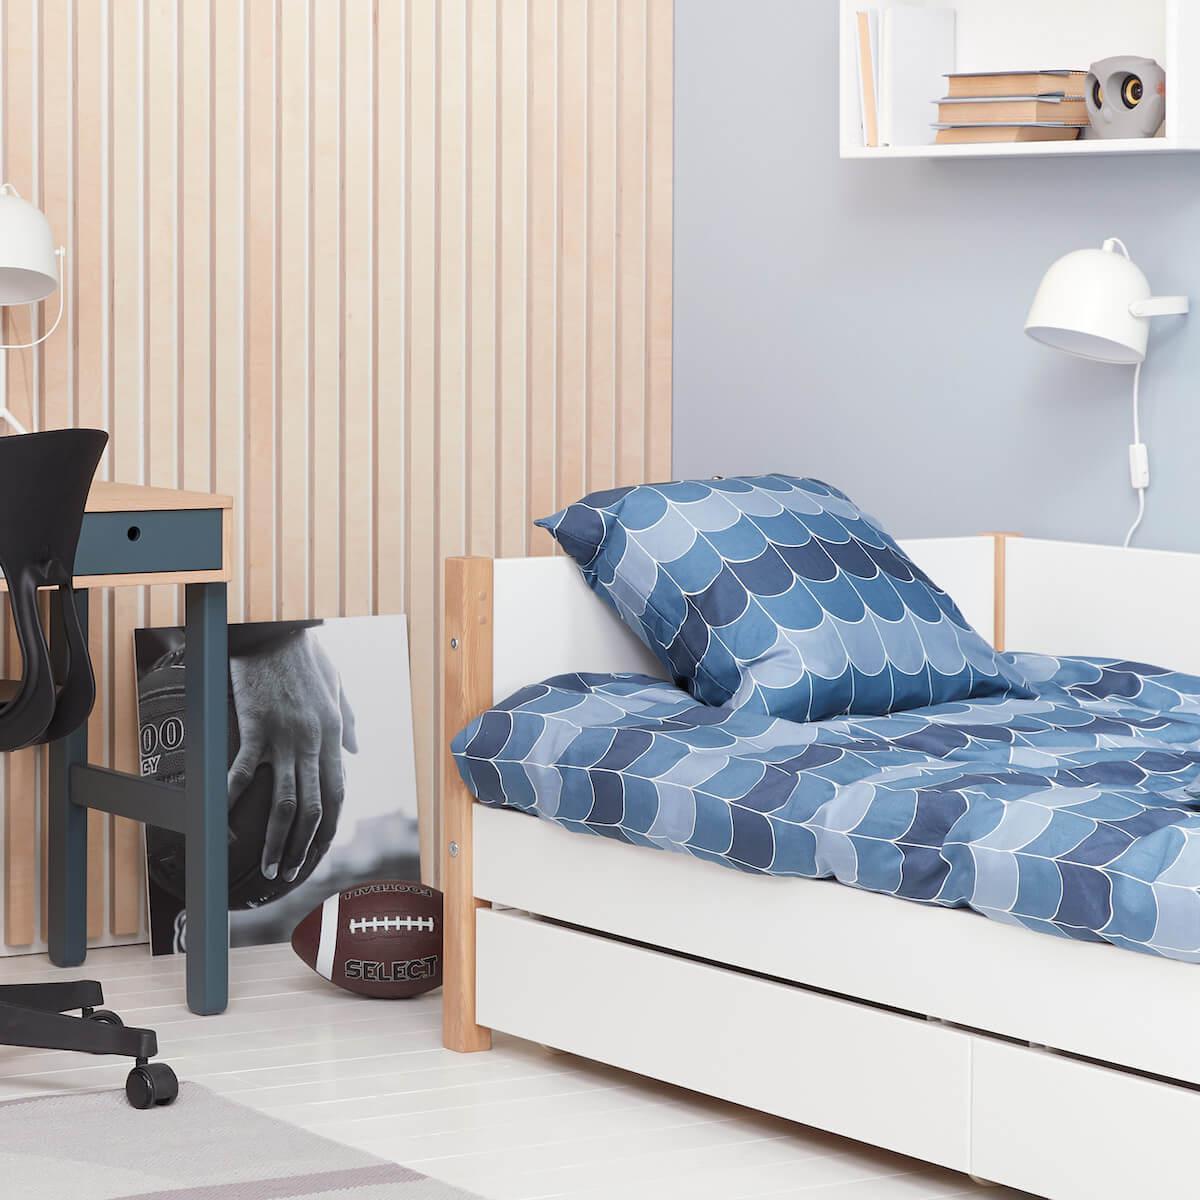 Cama-sofá 90x190cm 2 cajones NOR Flexa roble-blanco